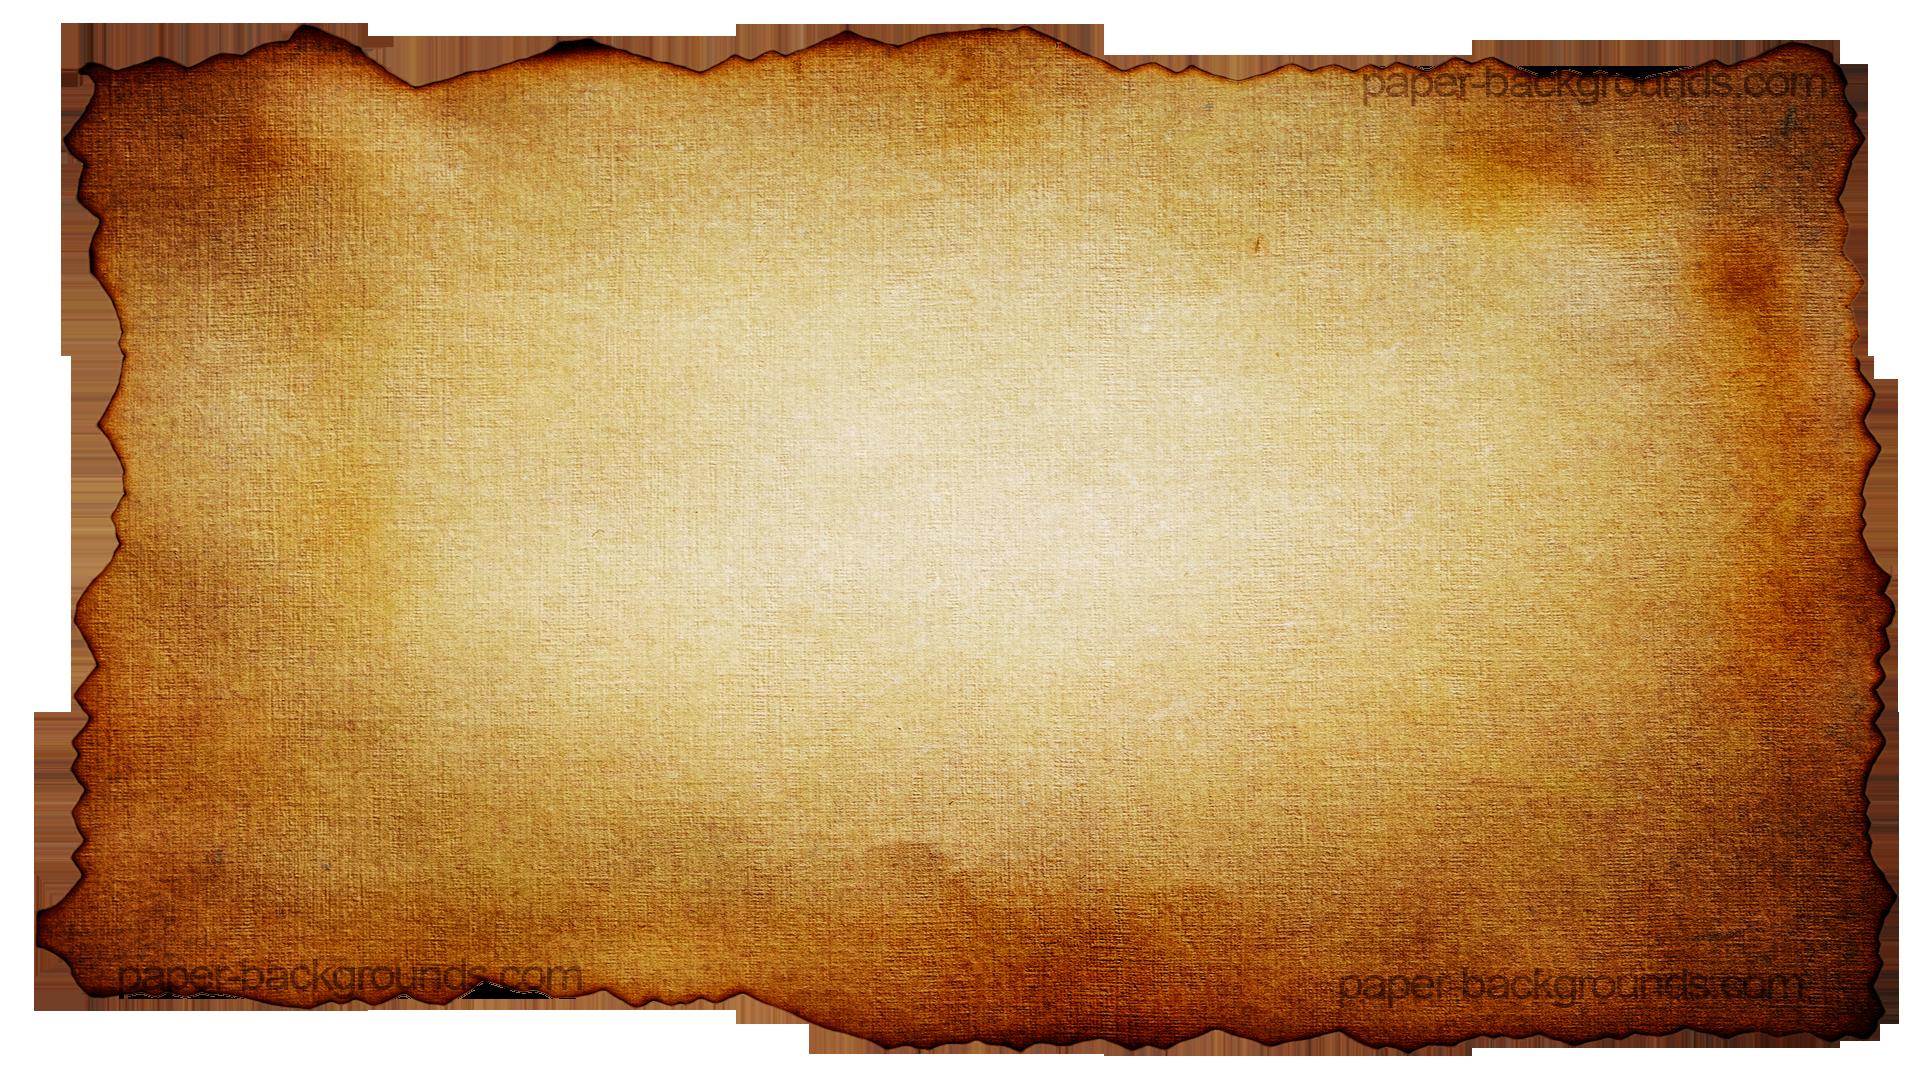 old burned vintage paper texture hd Paper Backgrounds 1920x1080